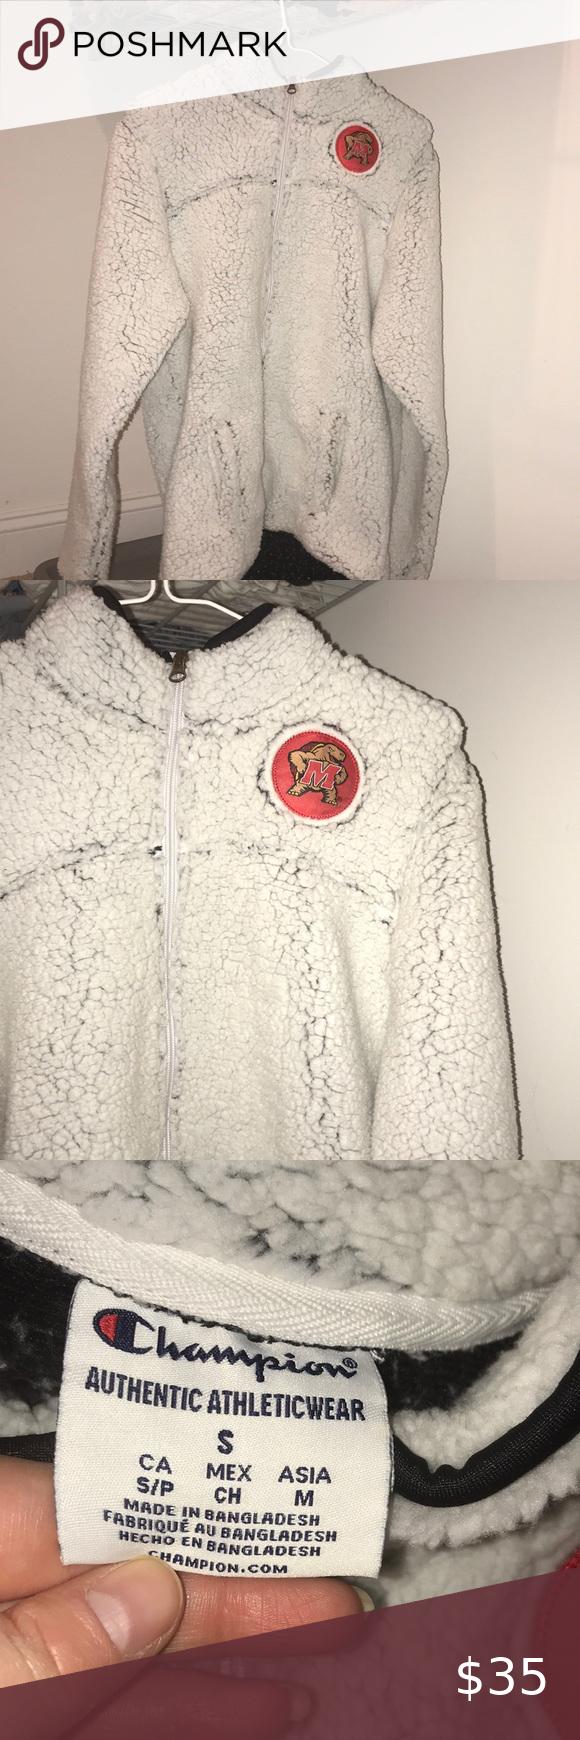 Champion Maryland Sherpa Like Jacket In Excellent Condition Champion Jackets Coats Coats Jackets Women Champion Hoodie Women Fashion [ 1740 x 580 Pixel ]